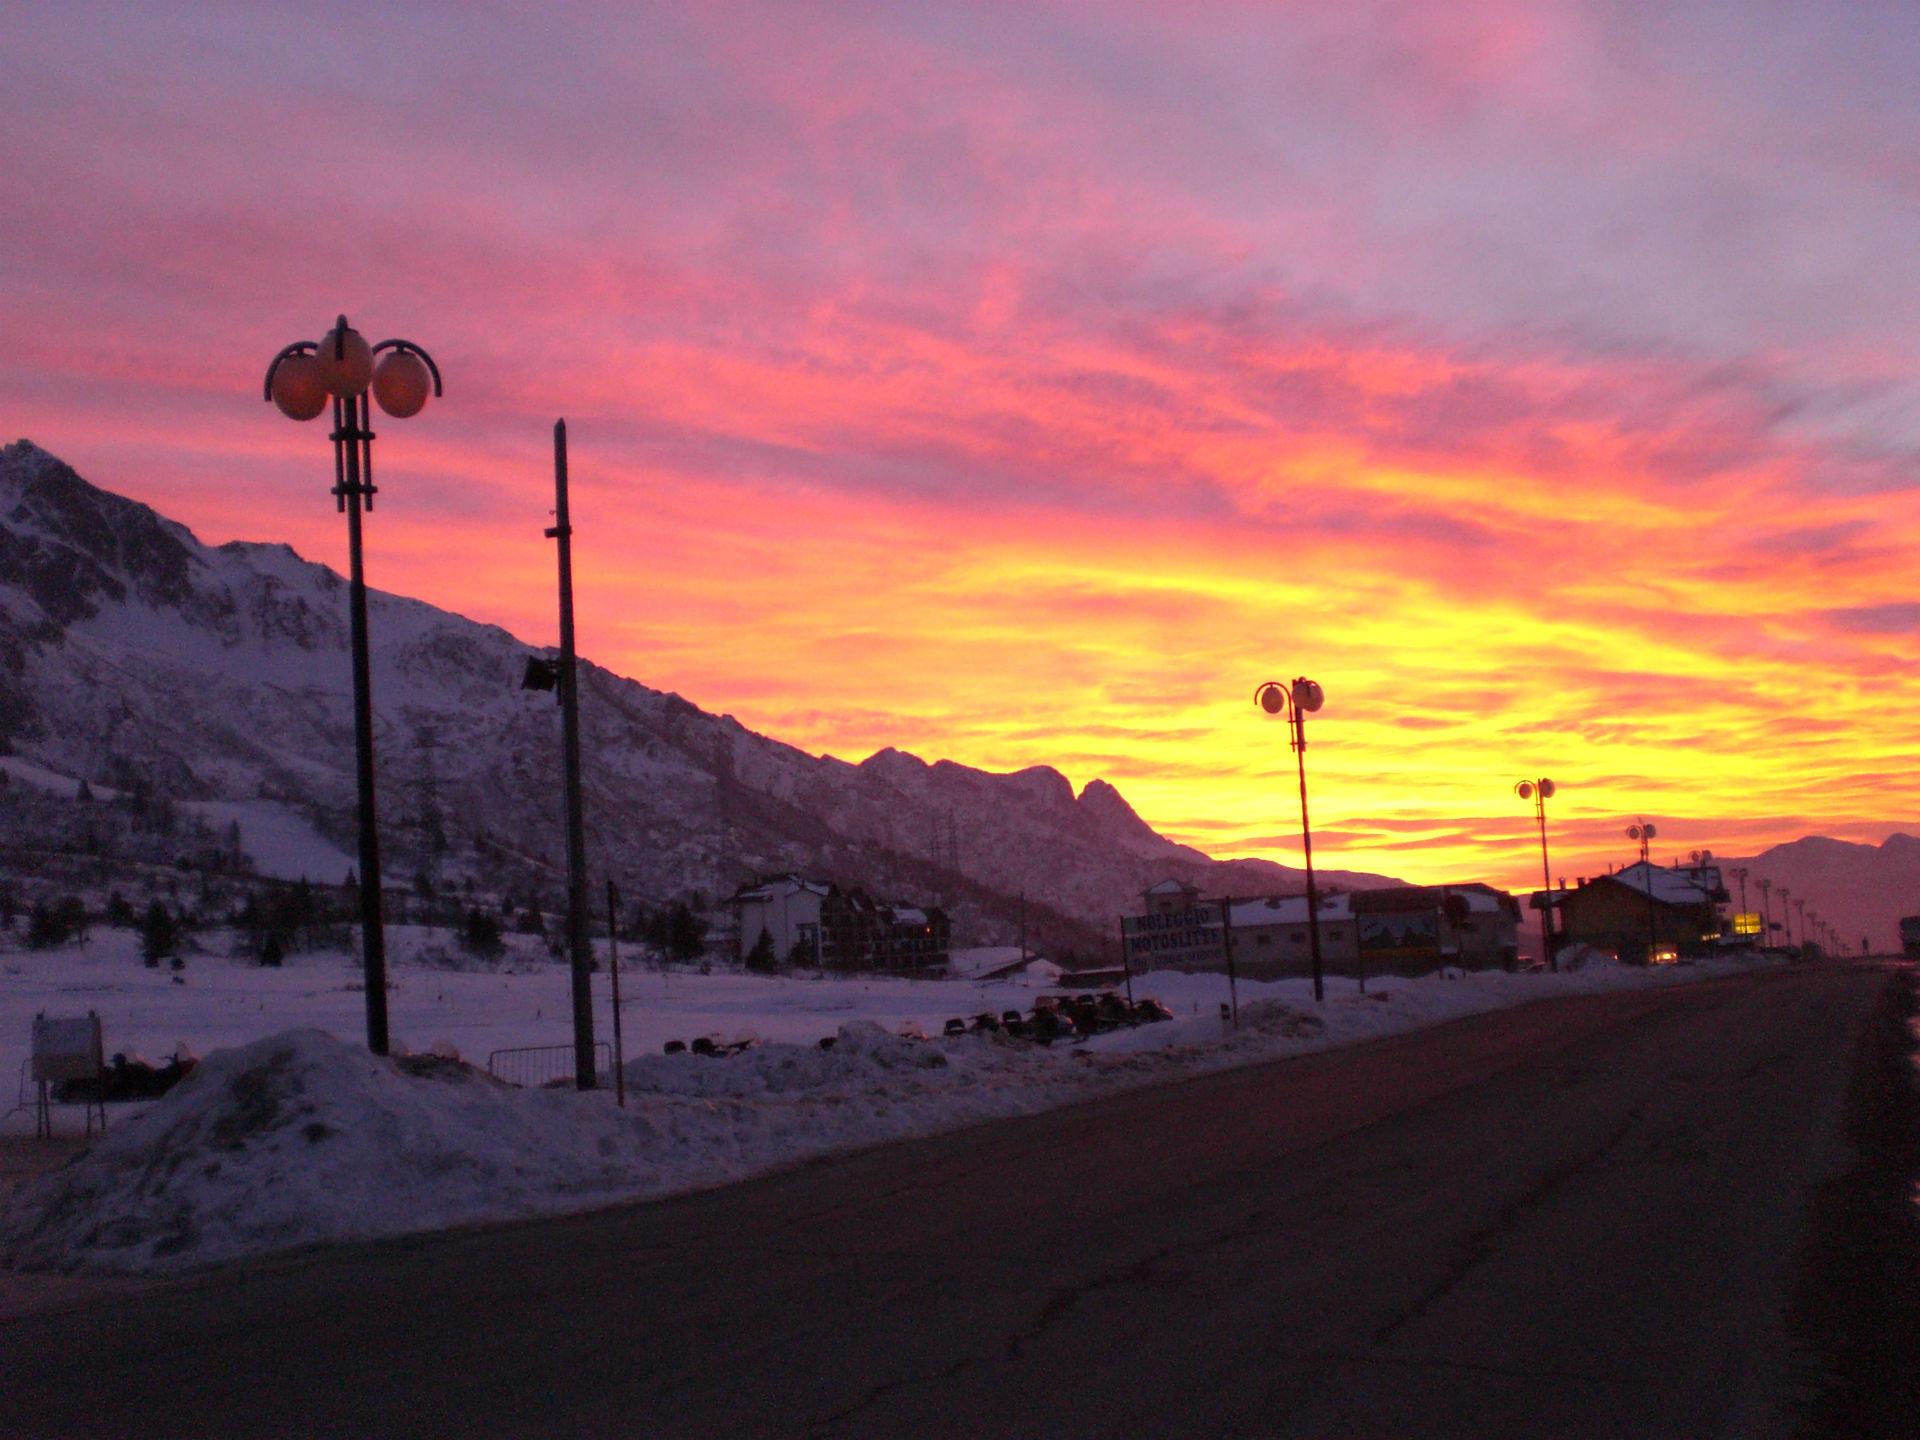 tramonto bellissimo in montagna dal Tonale foto di tramonti foto tramonto nuvole al tramonto